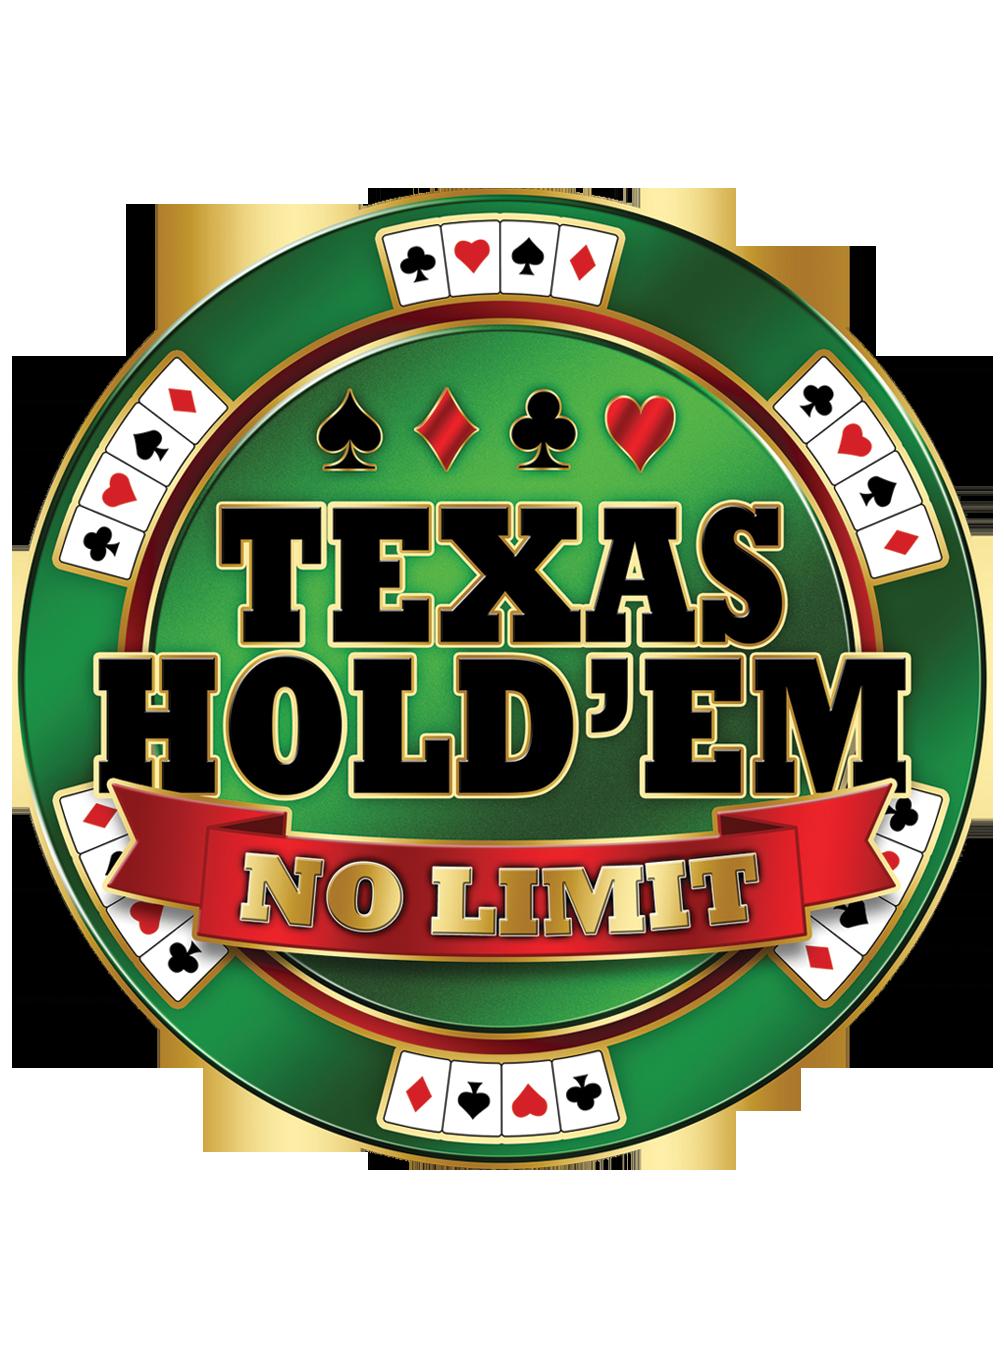 Holdem poker logo clip. Casino clipart texas hold em